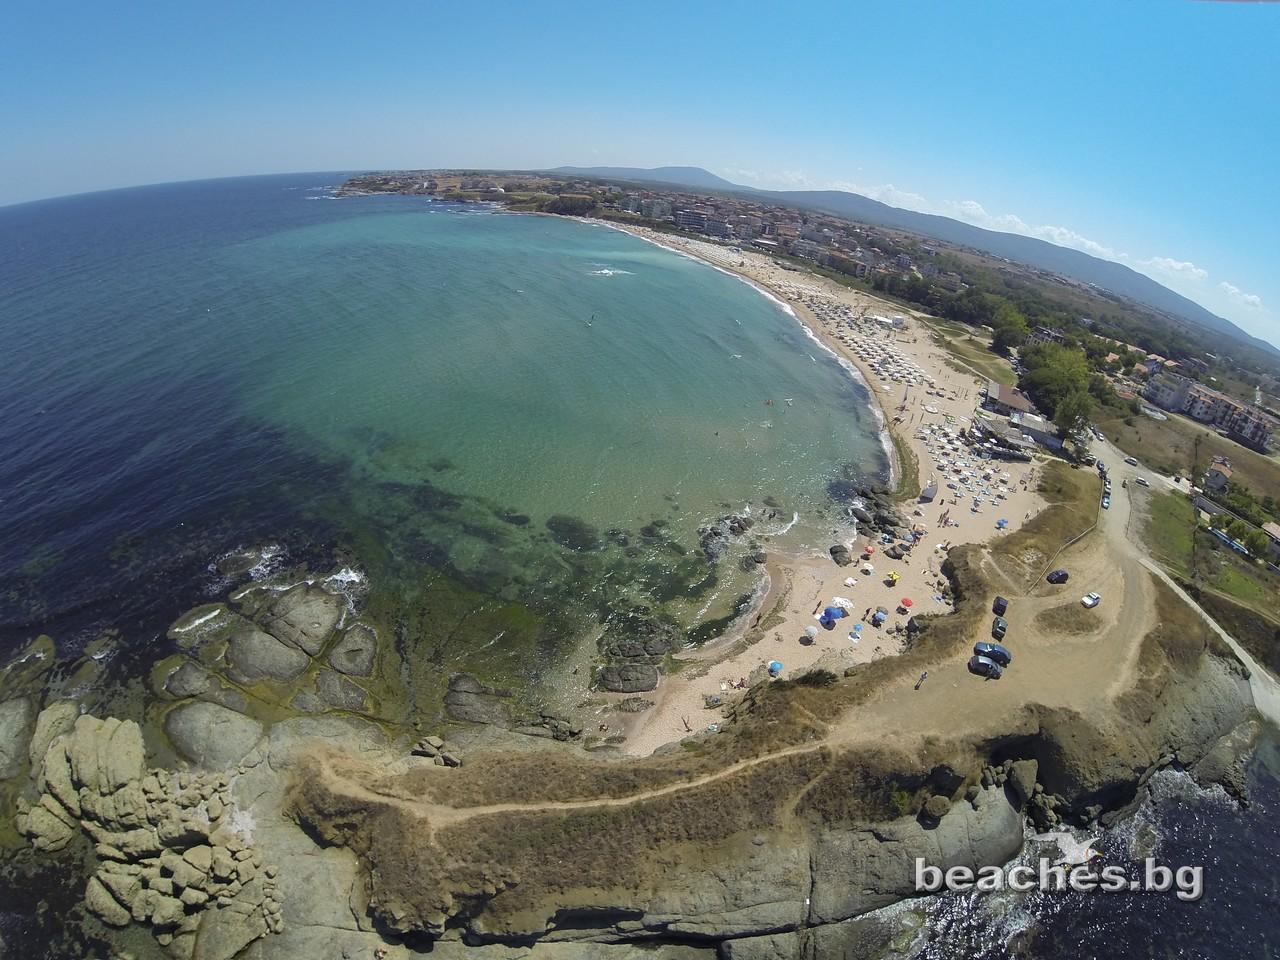 beaches.bg - Lozenets, Лозенец, България